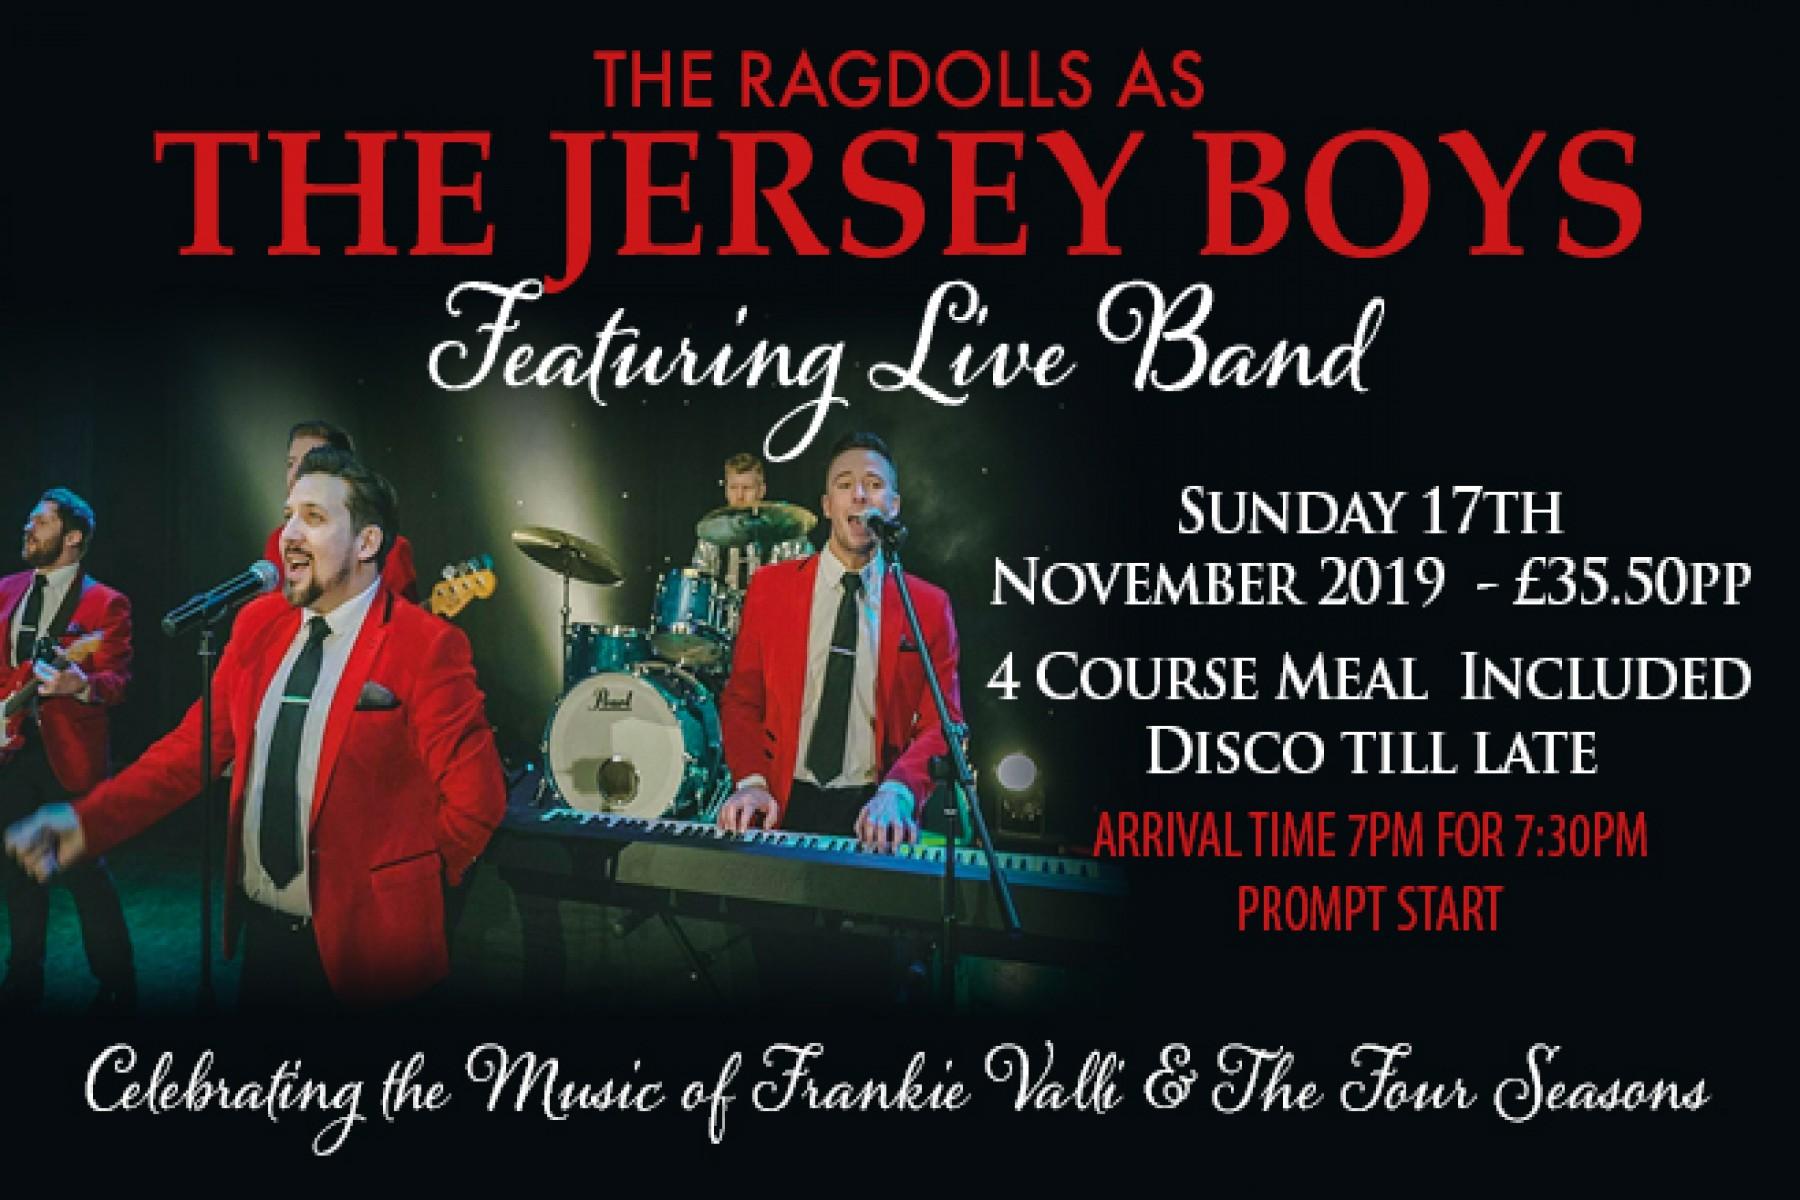 The Jersey Boys (17th November 2019)